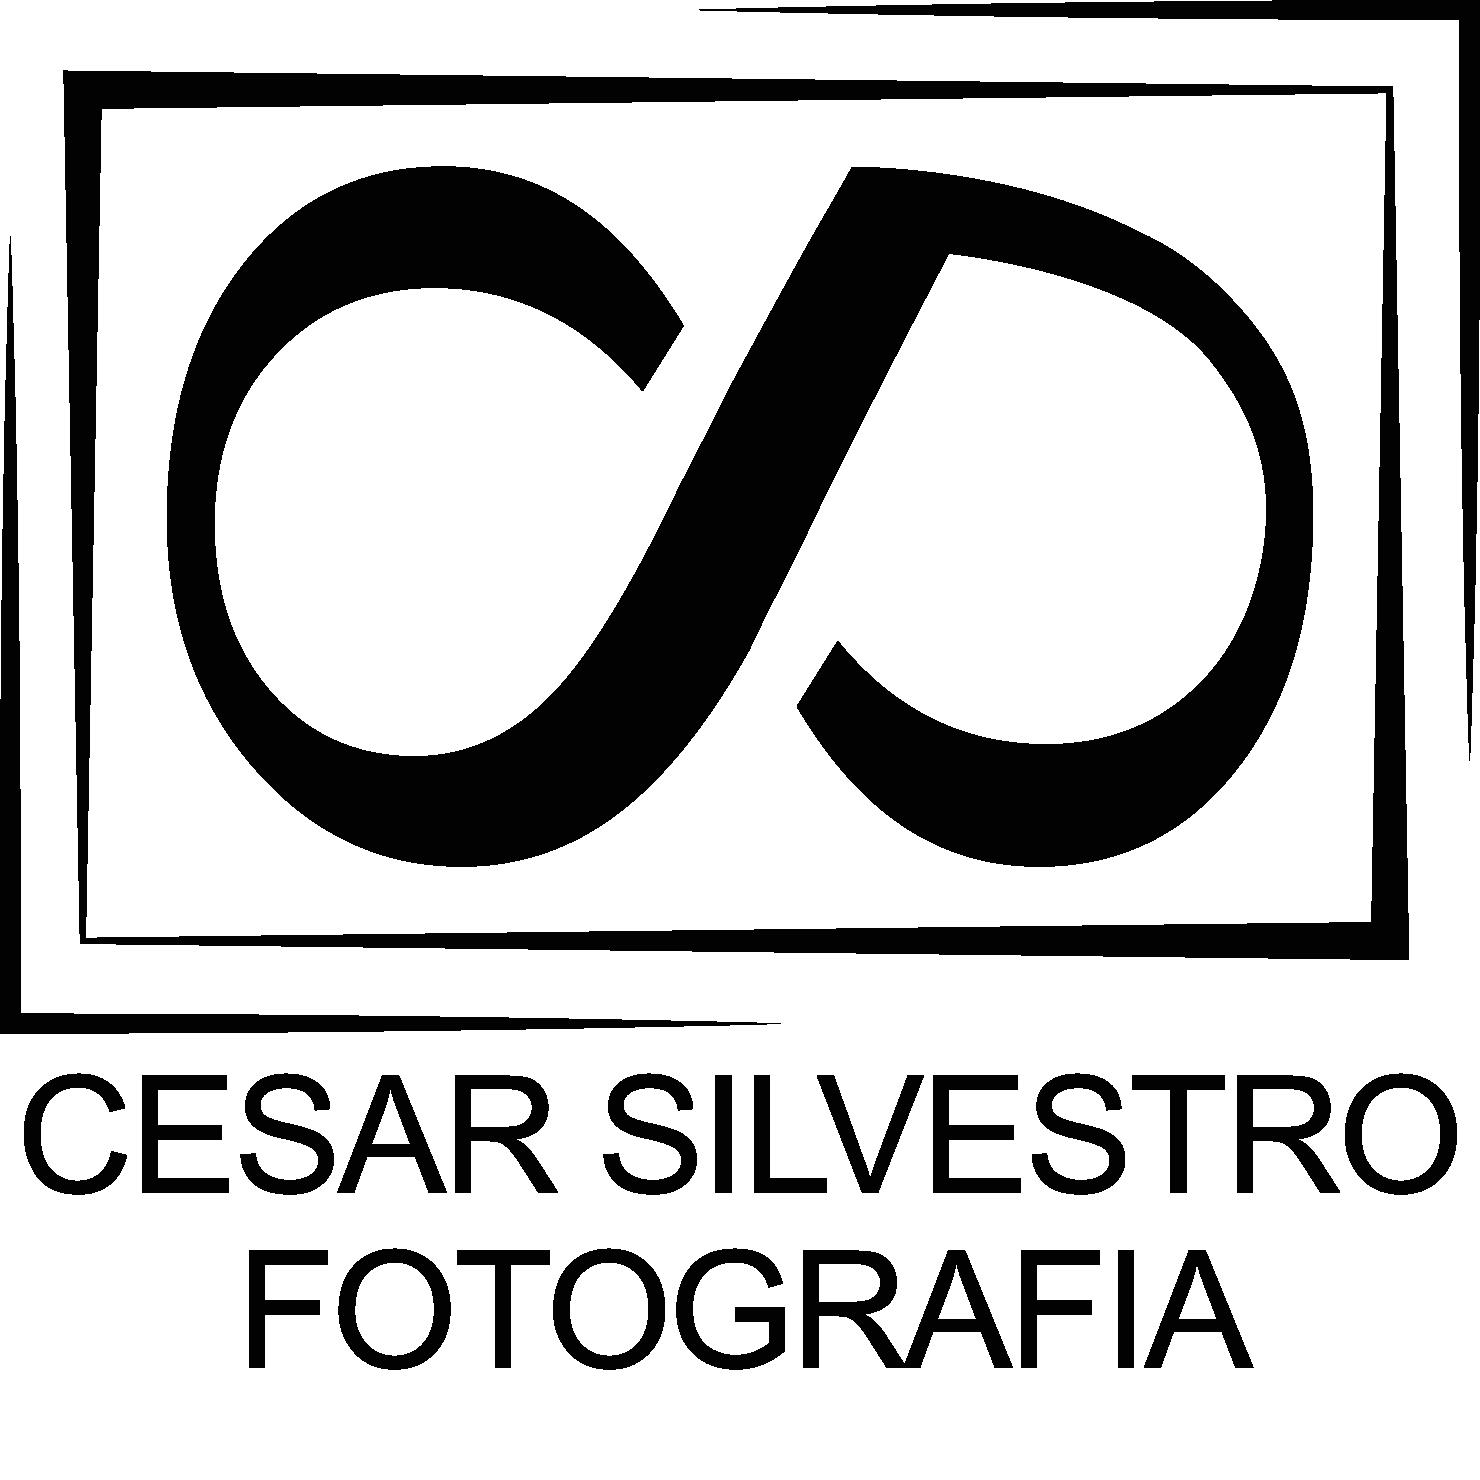 Logotipo de César Silvestro Fotografia